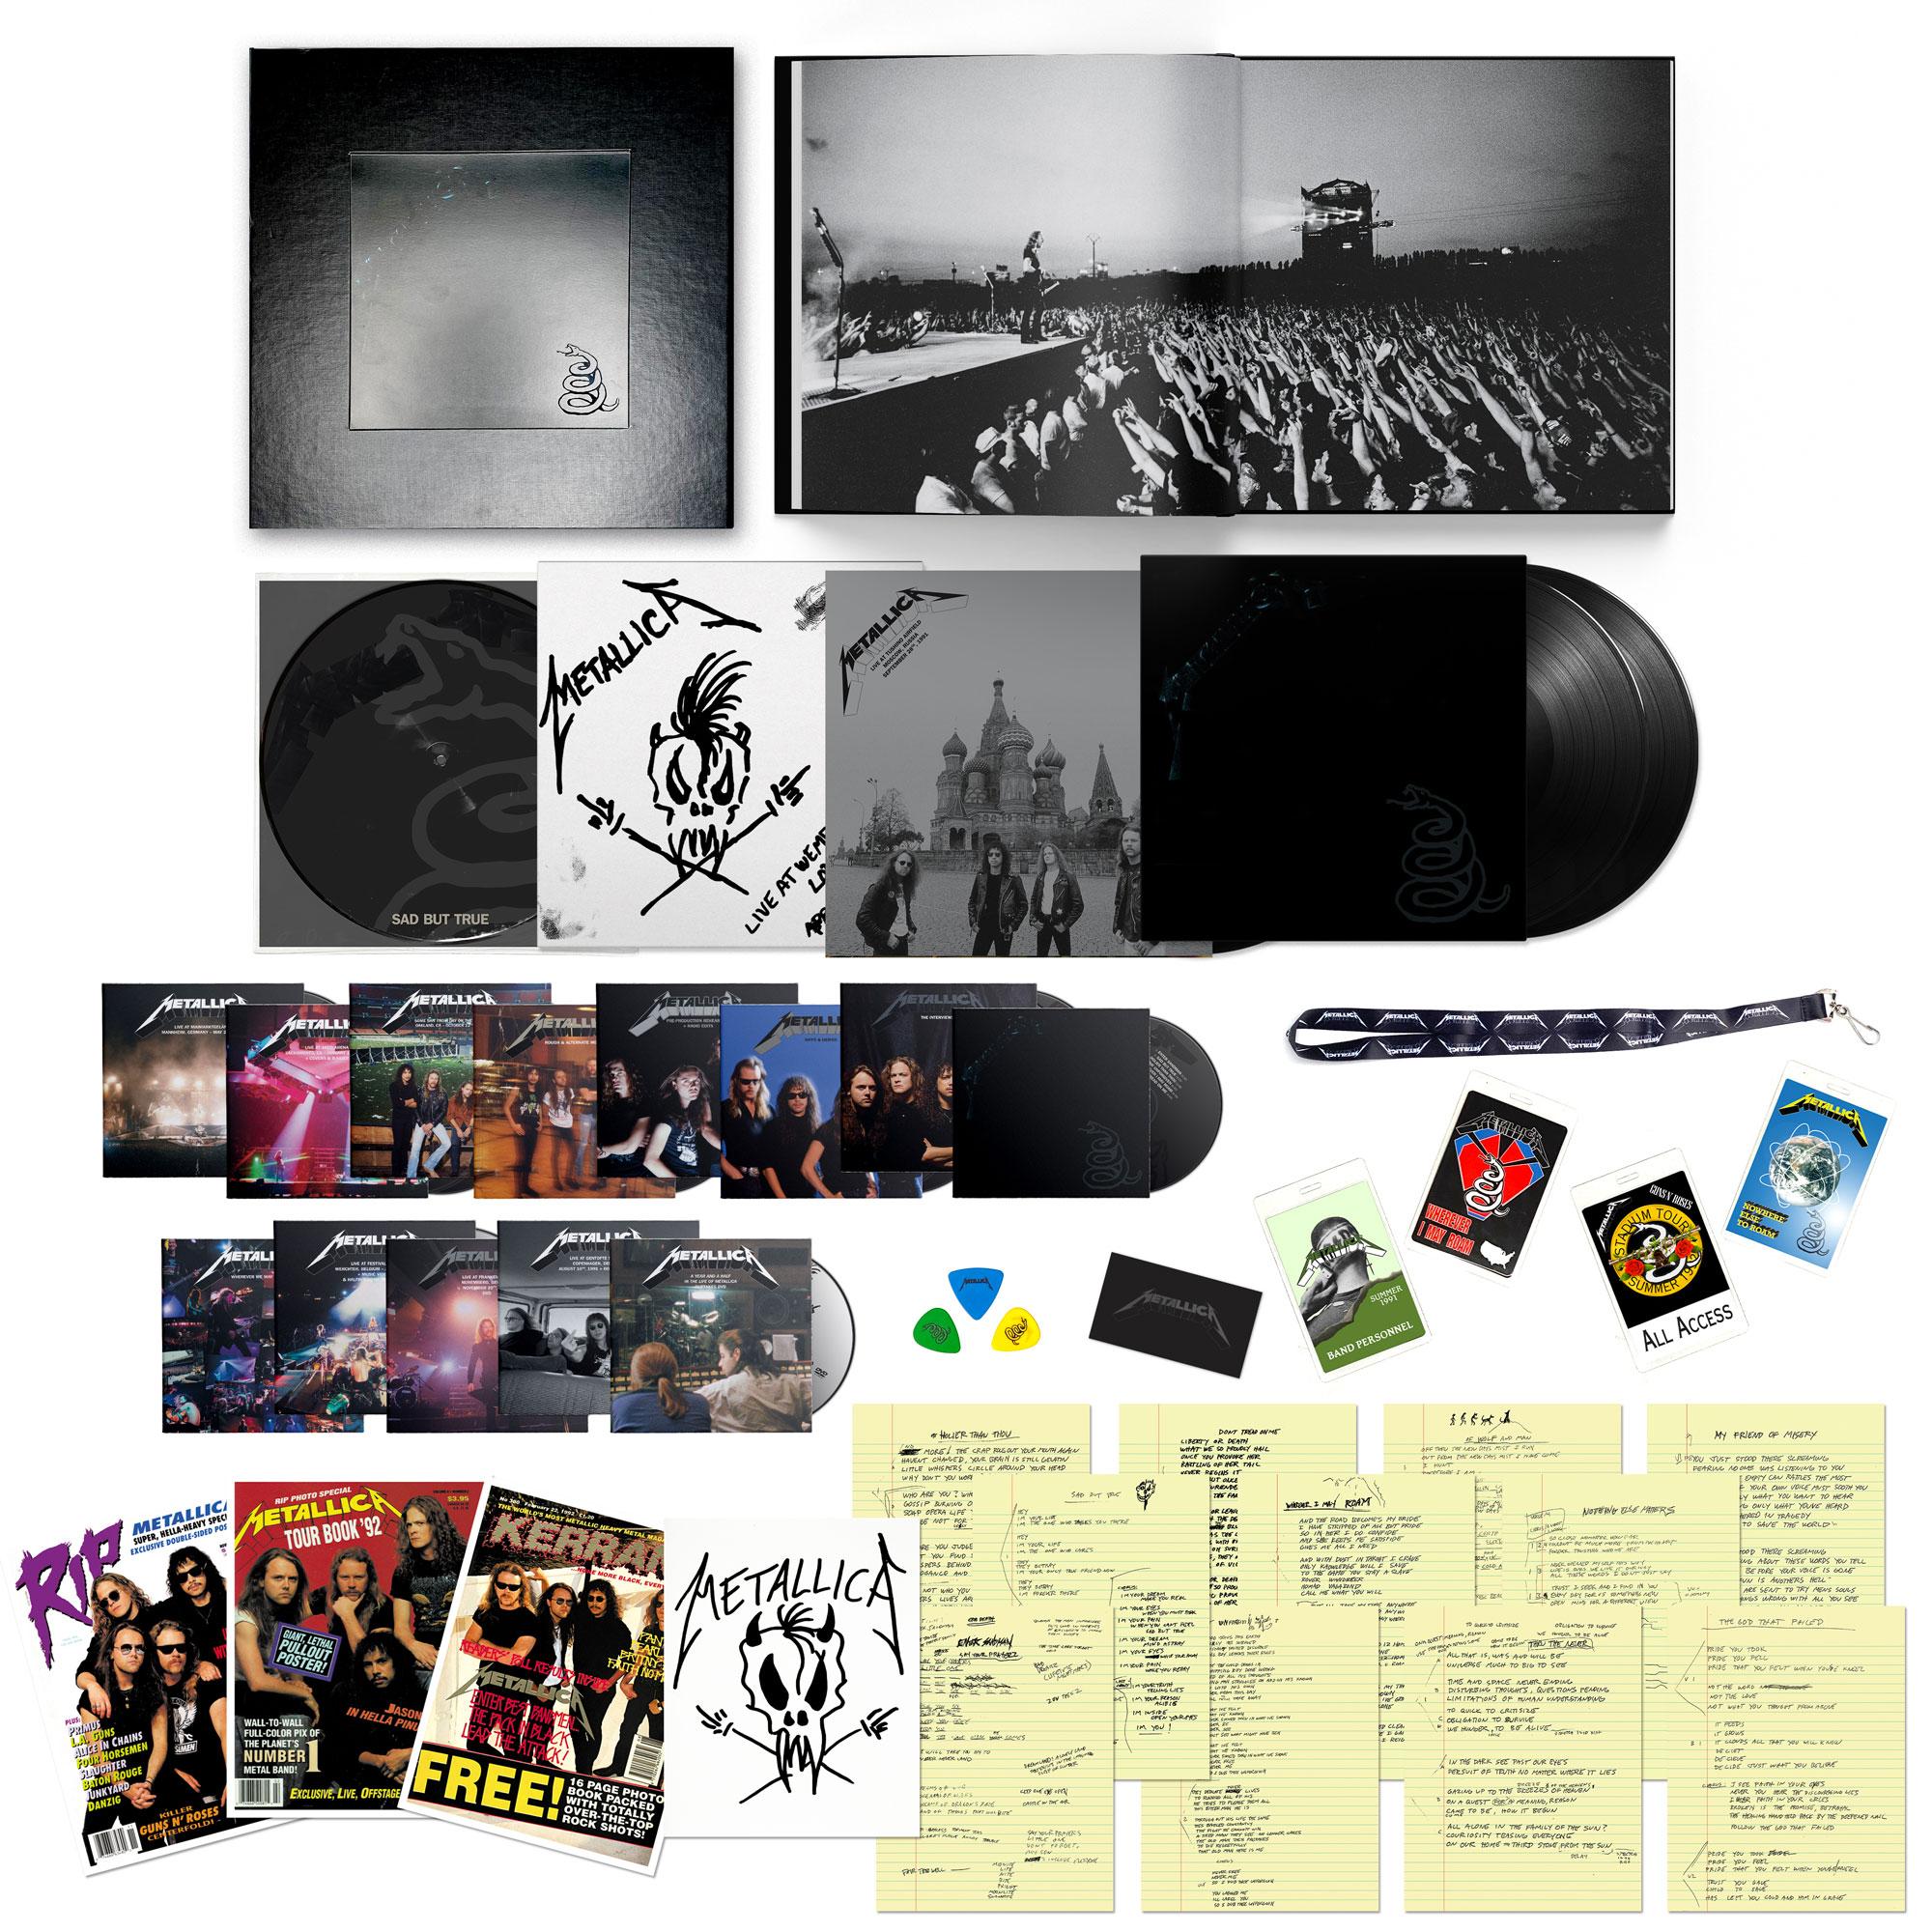 Metallica Remastered. Arrives September 10th.